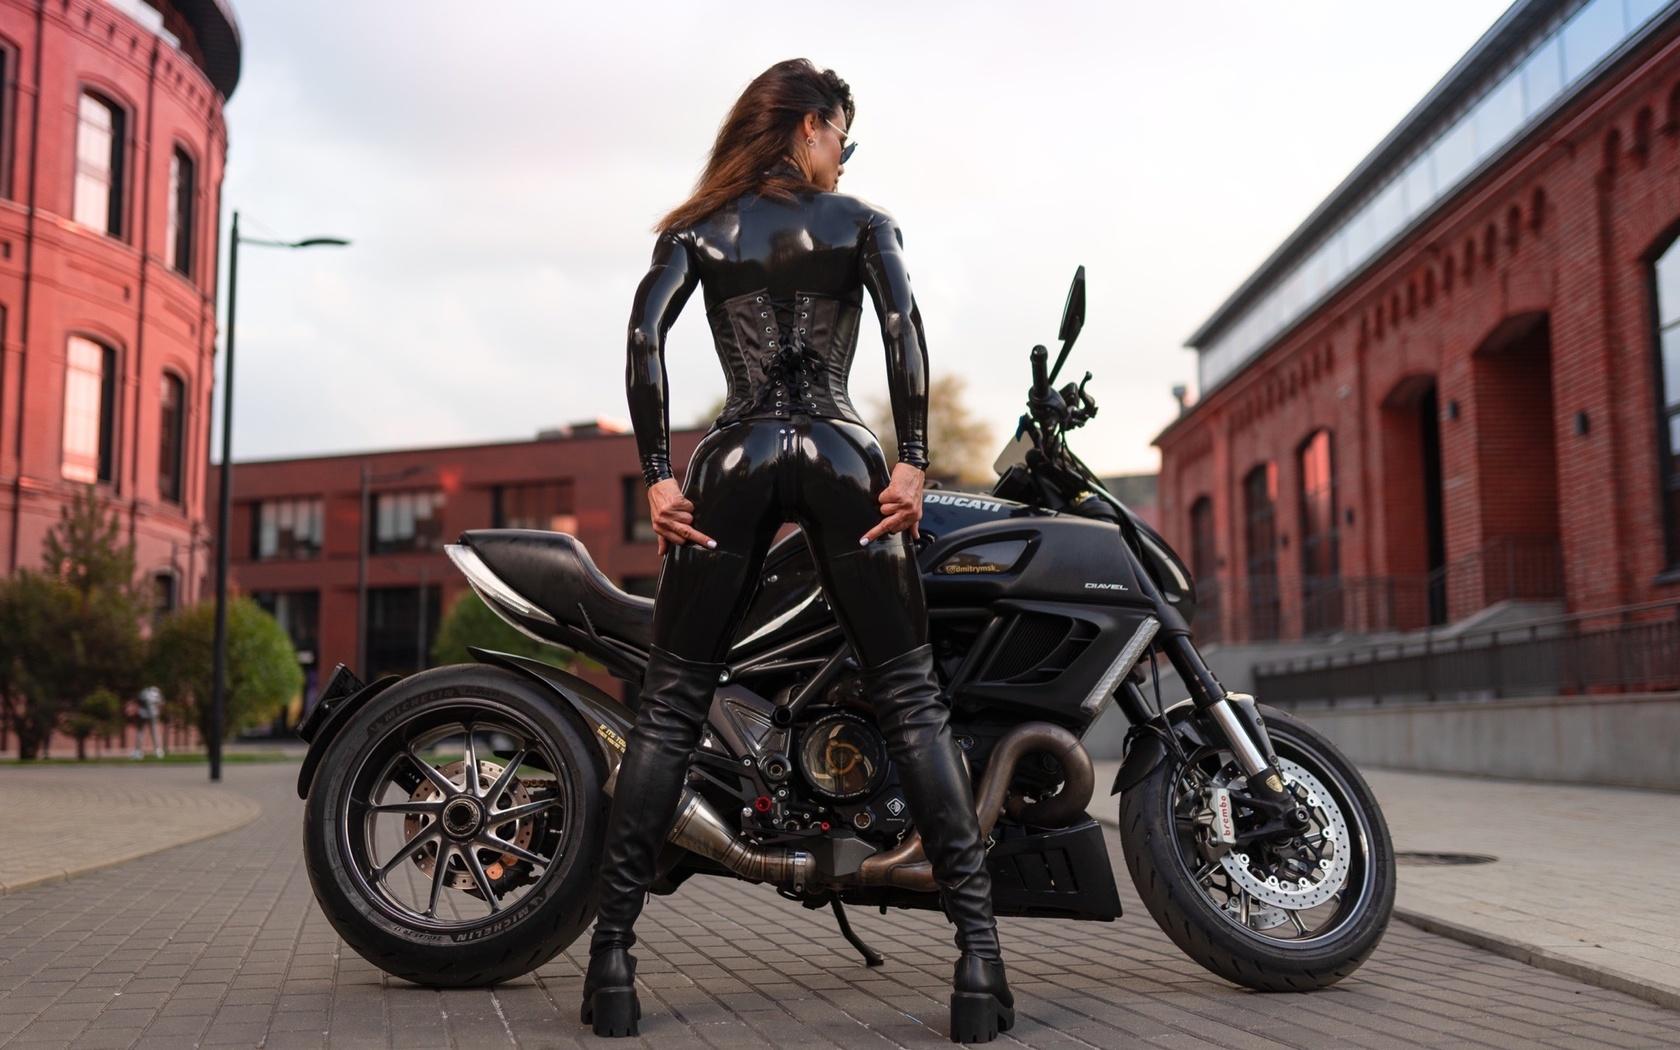 ducati, мотоцикл, байк, таша зайцева, модель, илья пистолетов, латекс